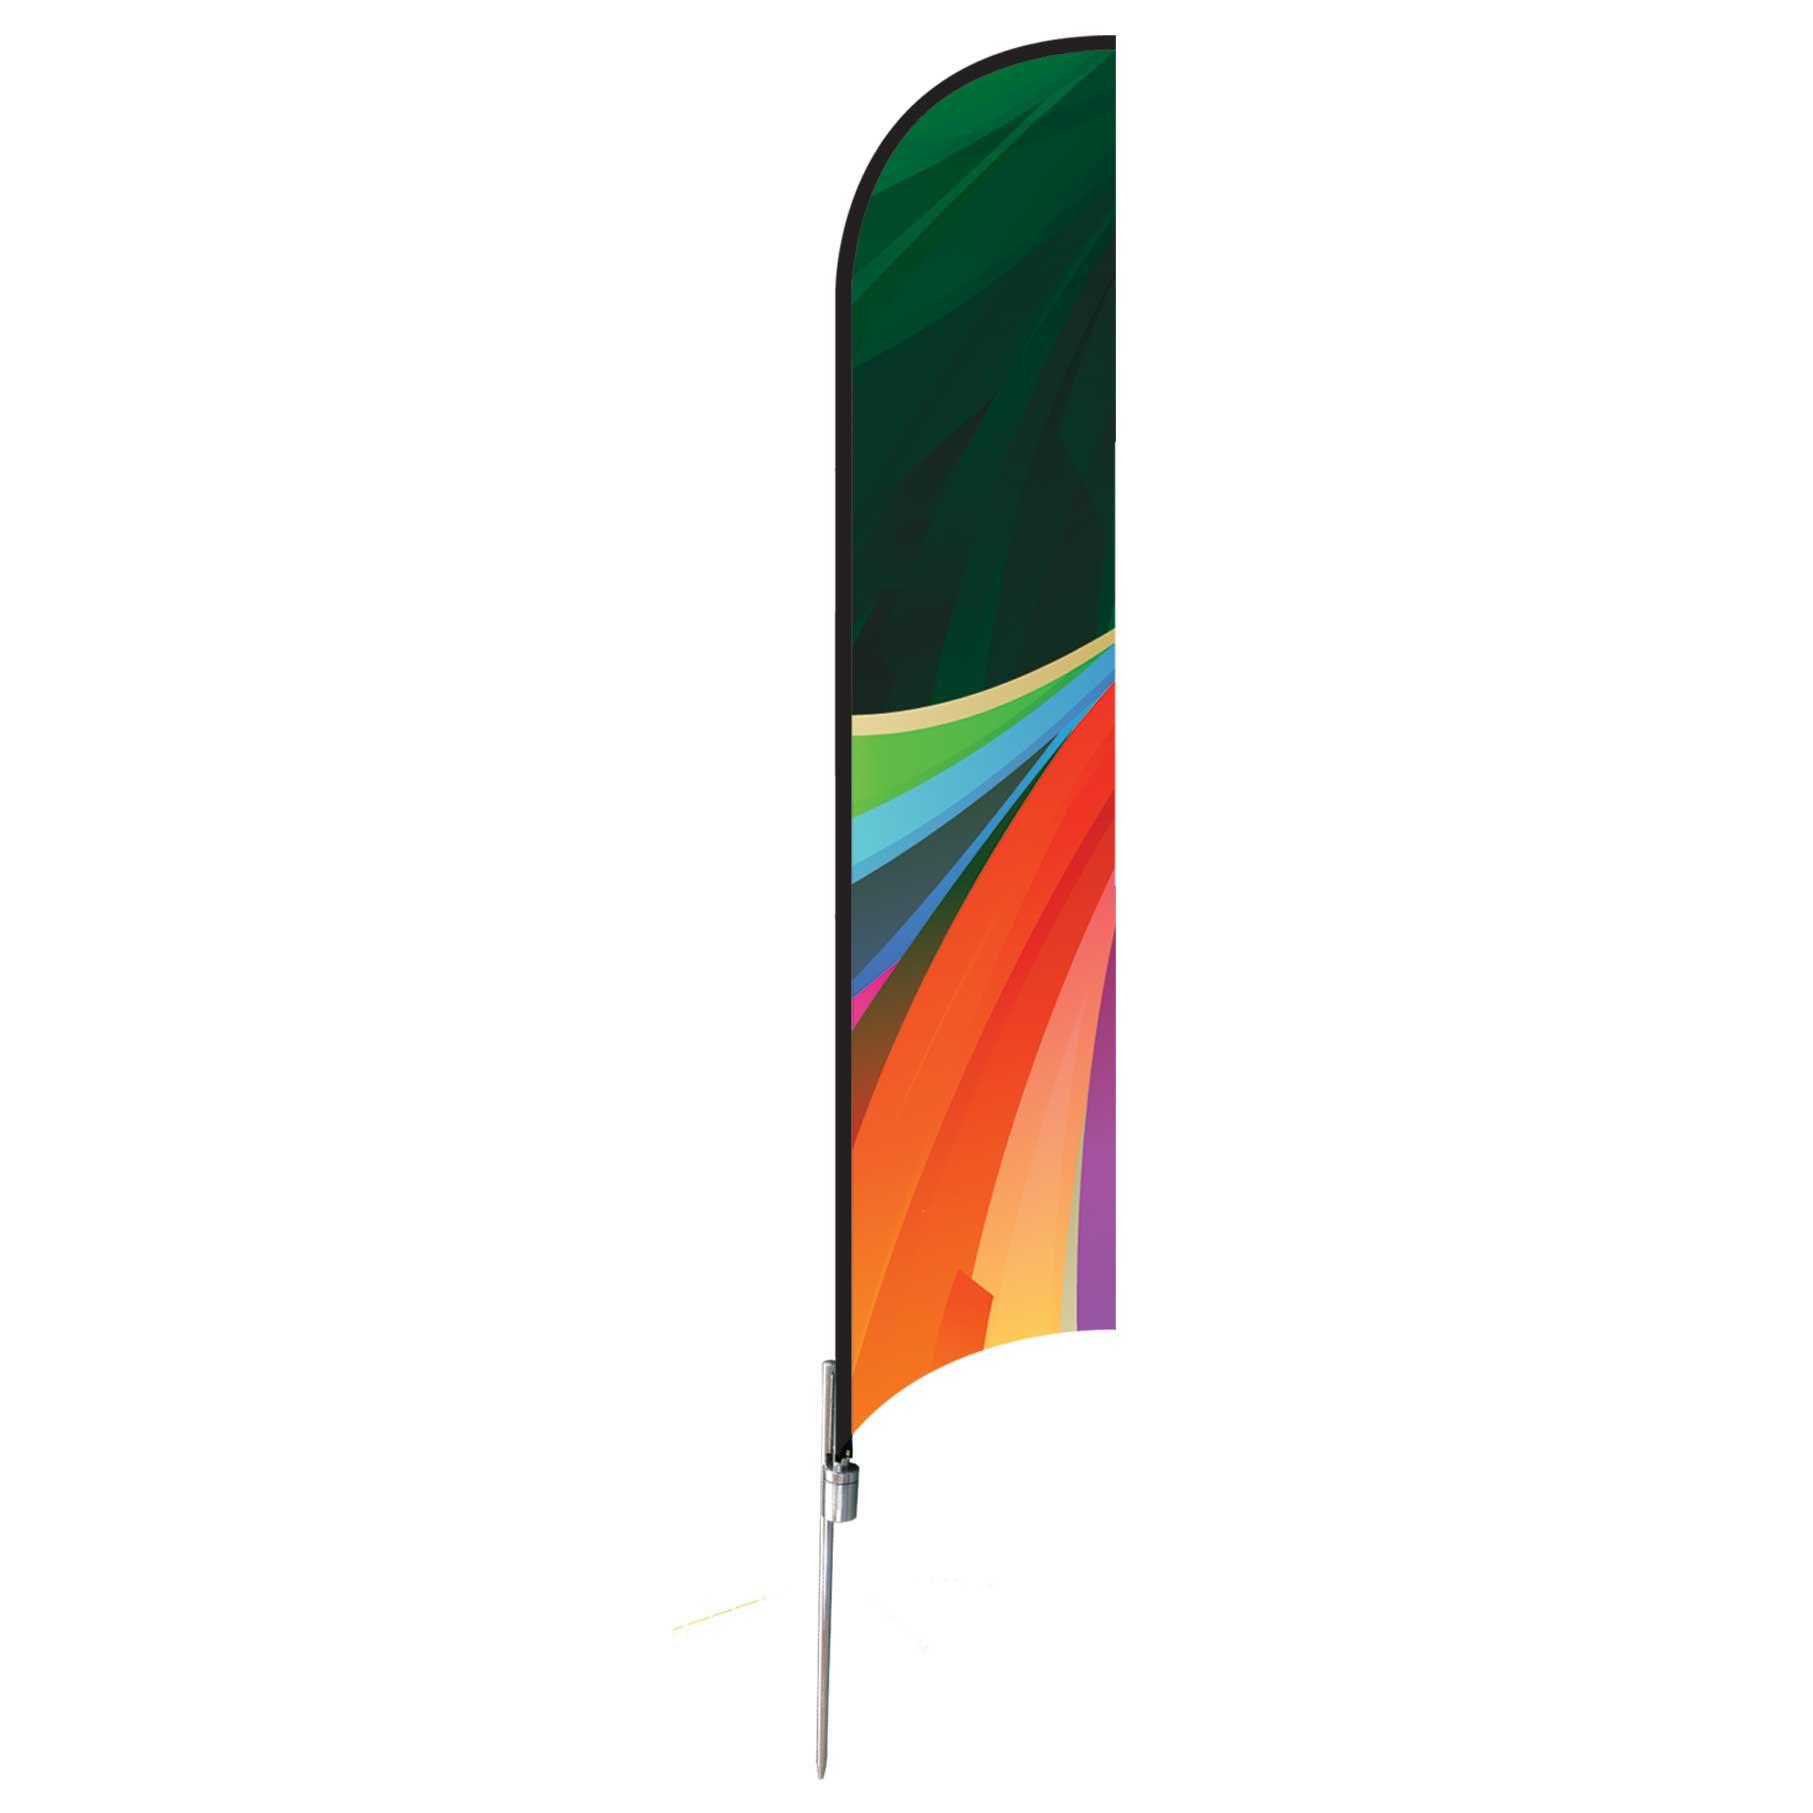 Blade Banner Kit - Quantity 1